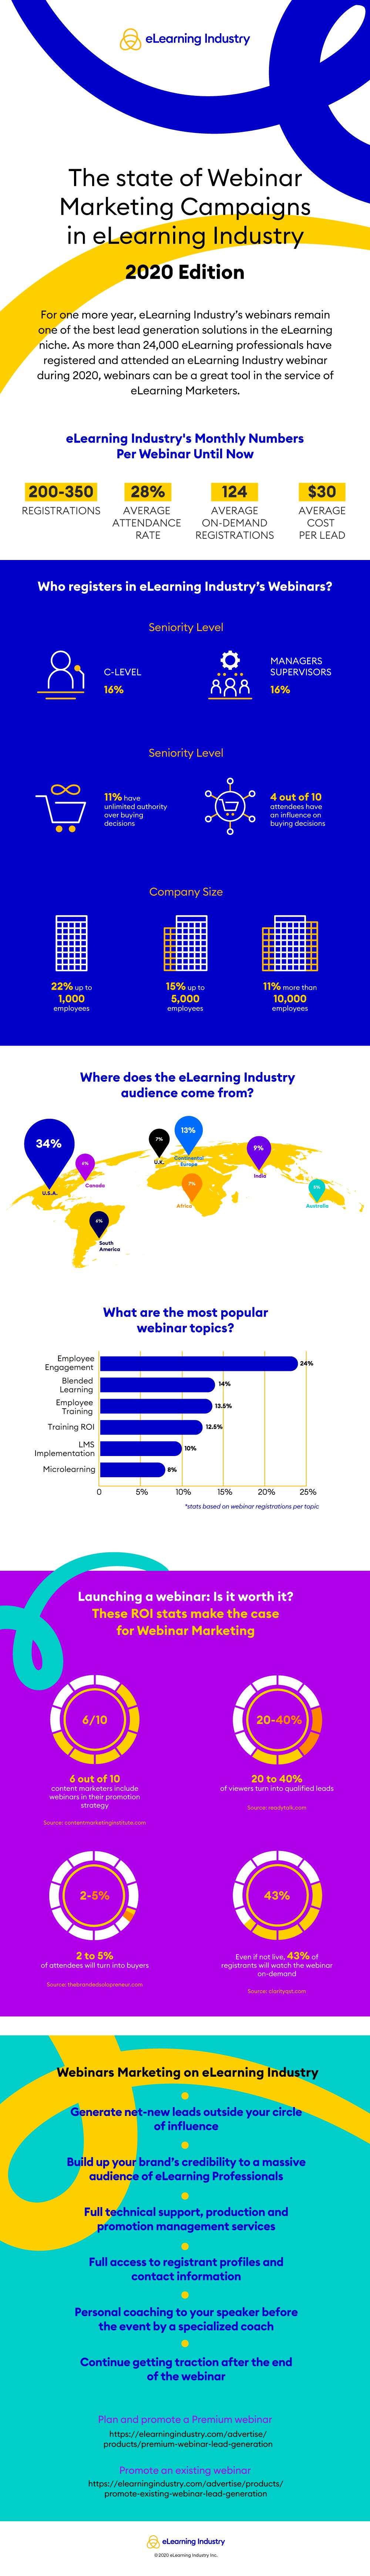 Webinar Marketing infographic